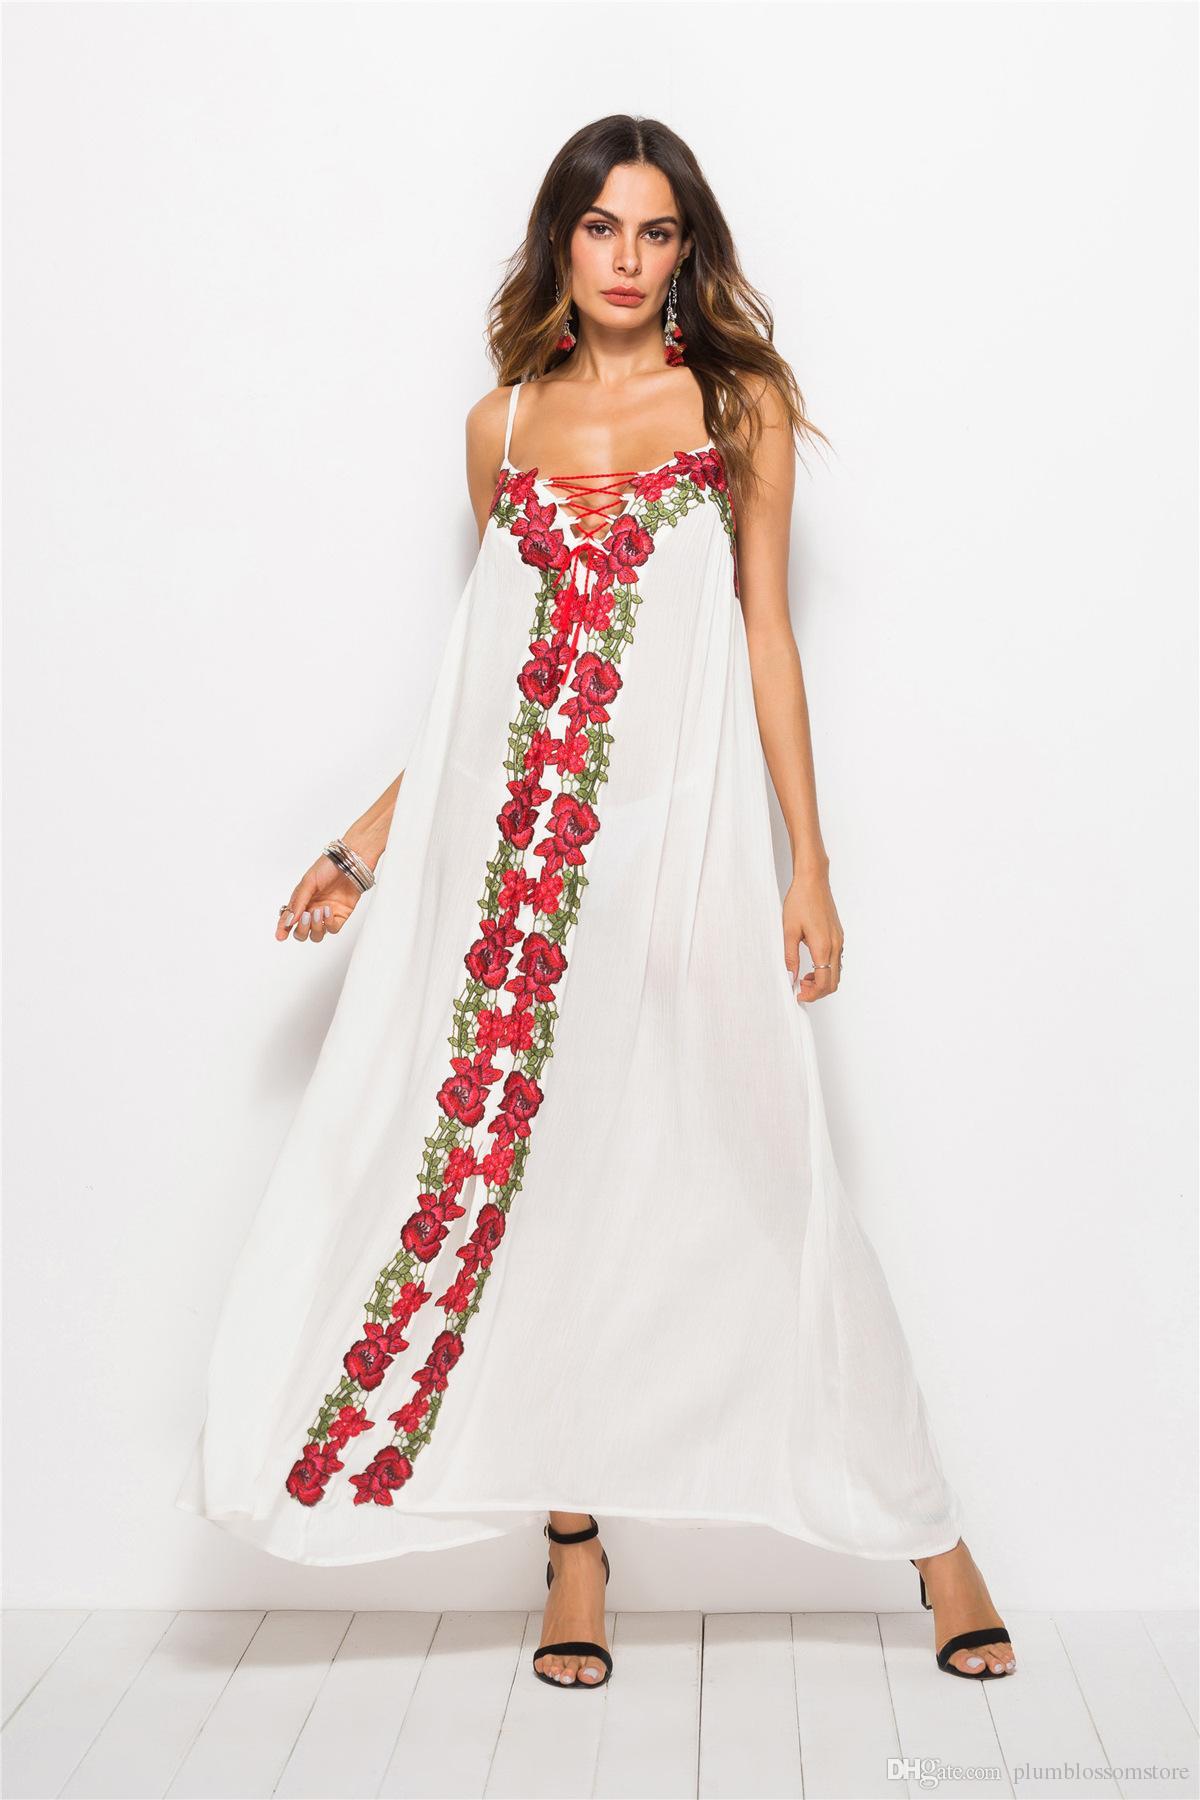 Plus Size Fashion Ethnic Embroidery Dresses Bohemian Long Maxi Women Boho  Dress 2019 New Summer Casual Sundress Beach Holiday Seaside Robes  Graduation ...